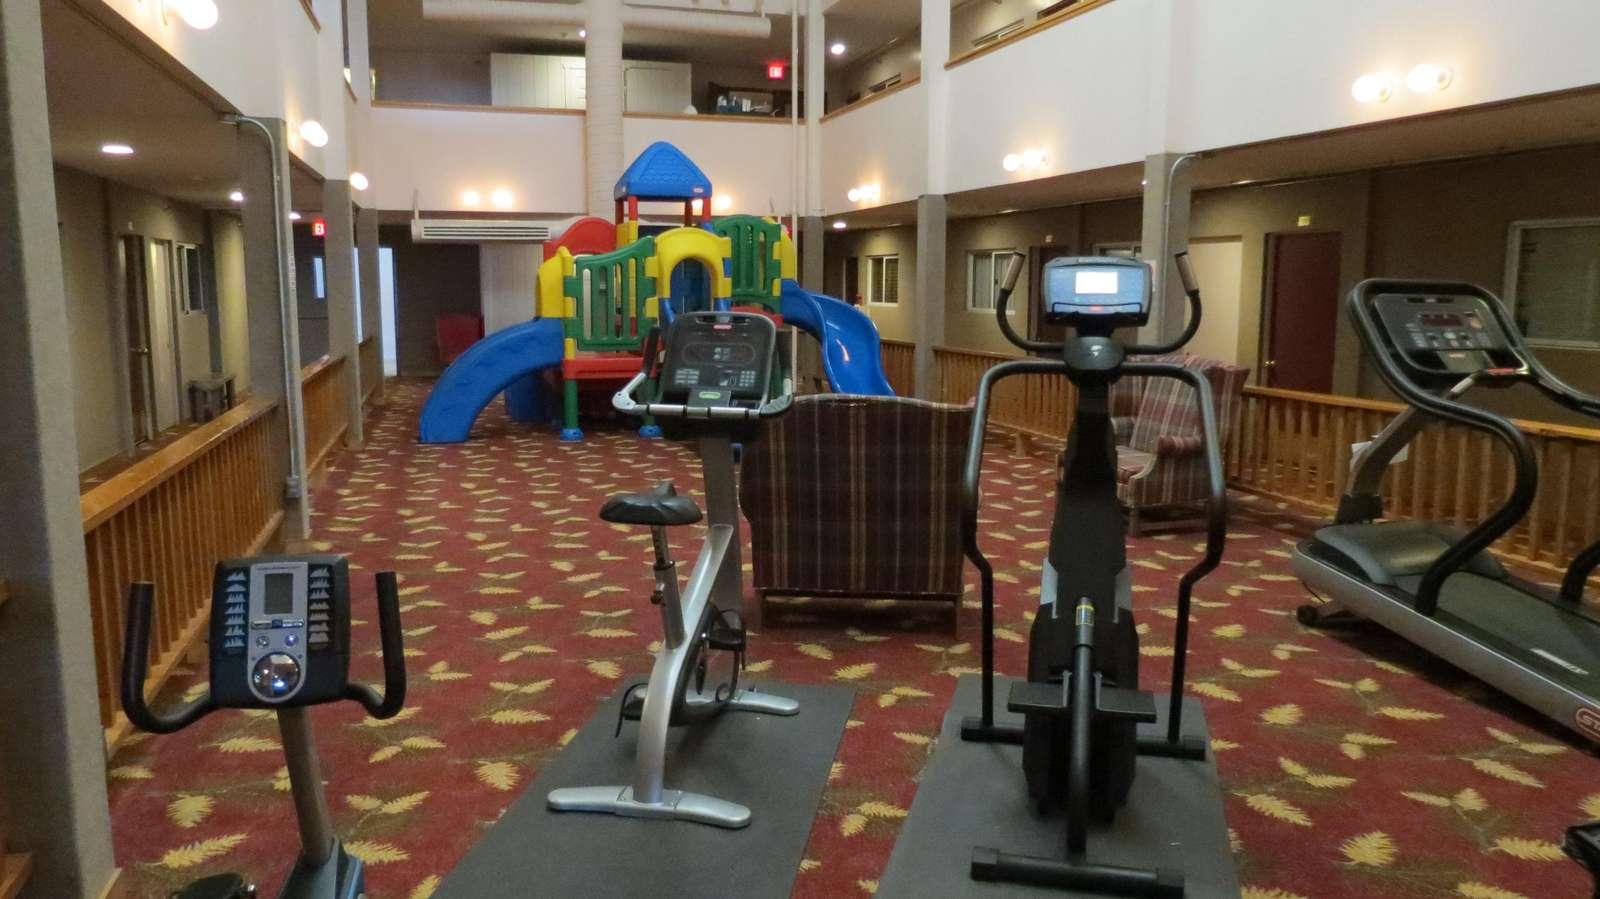 Gym/Play Area